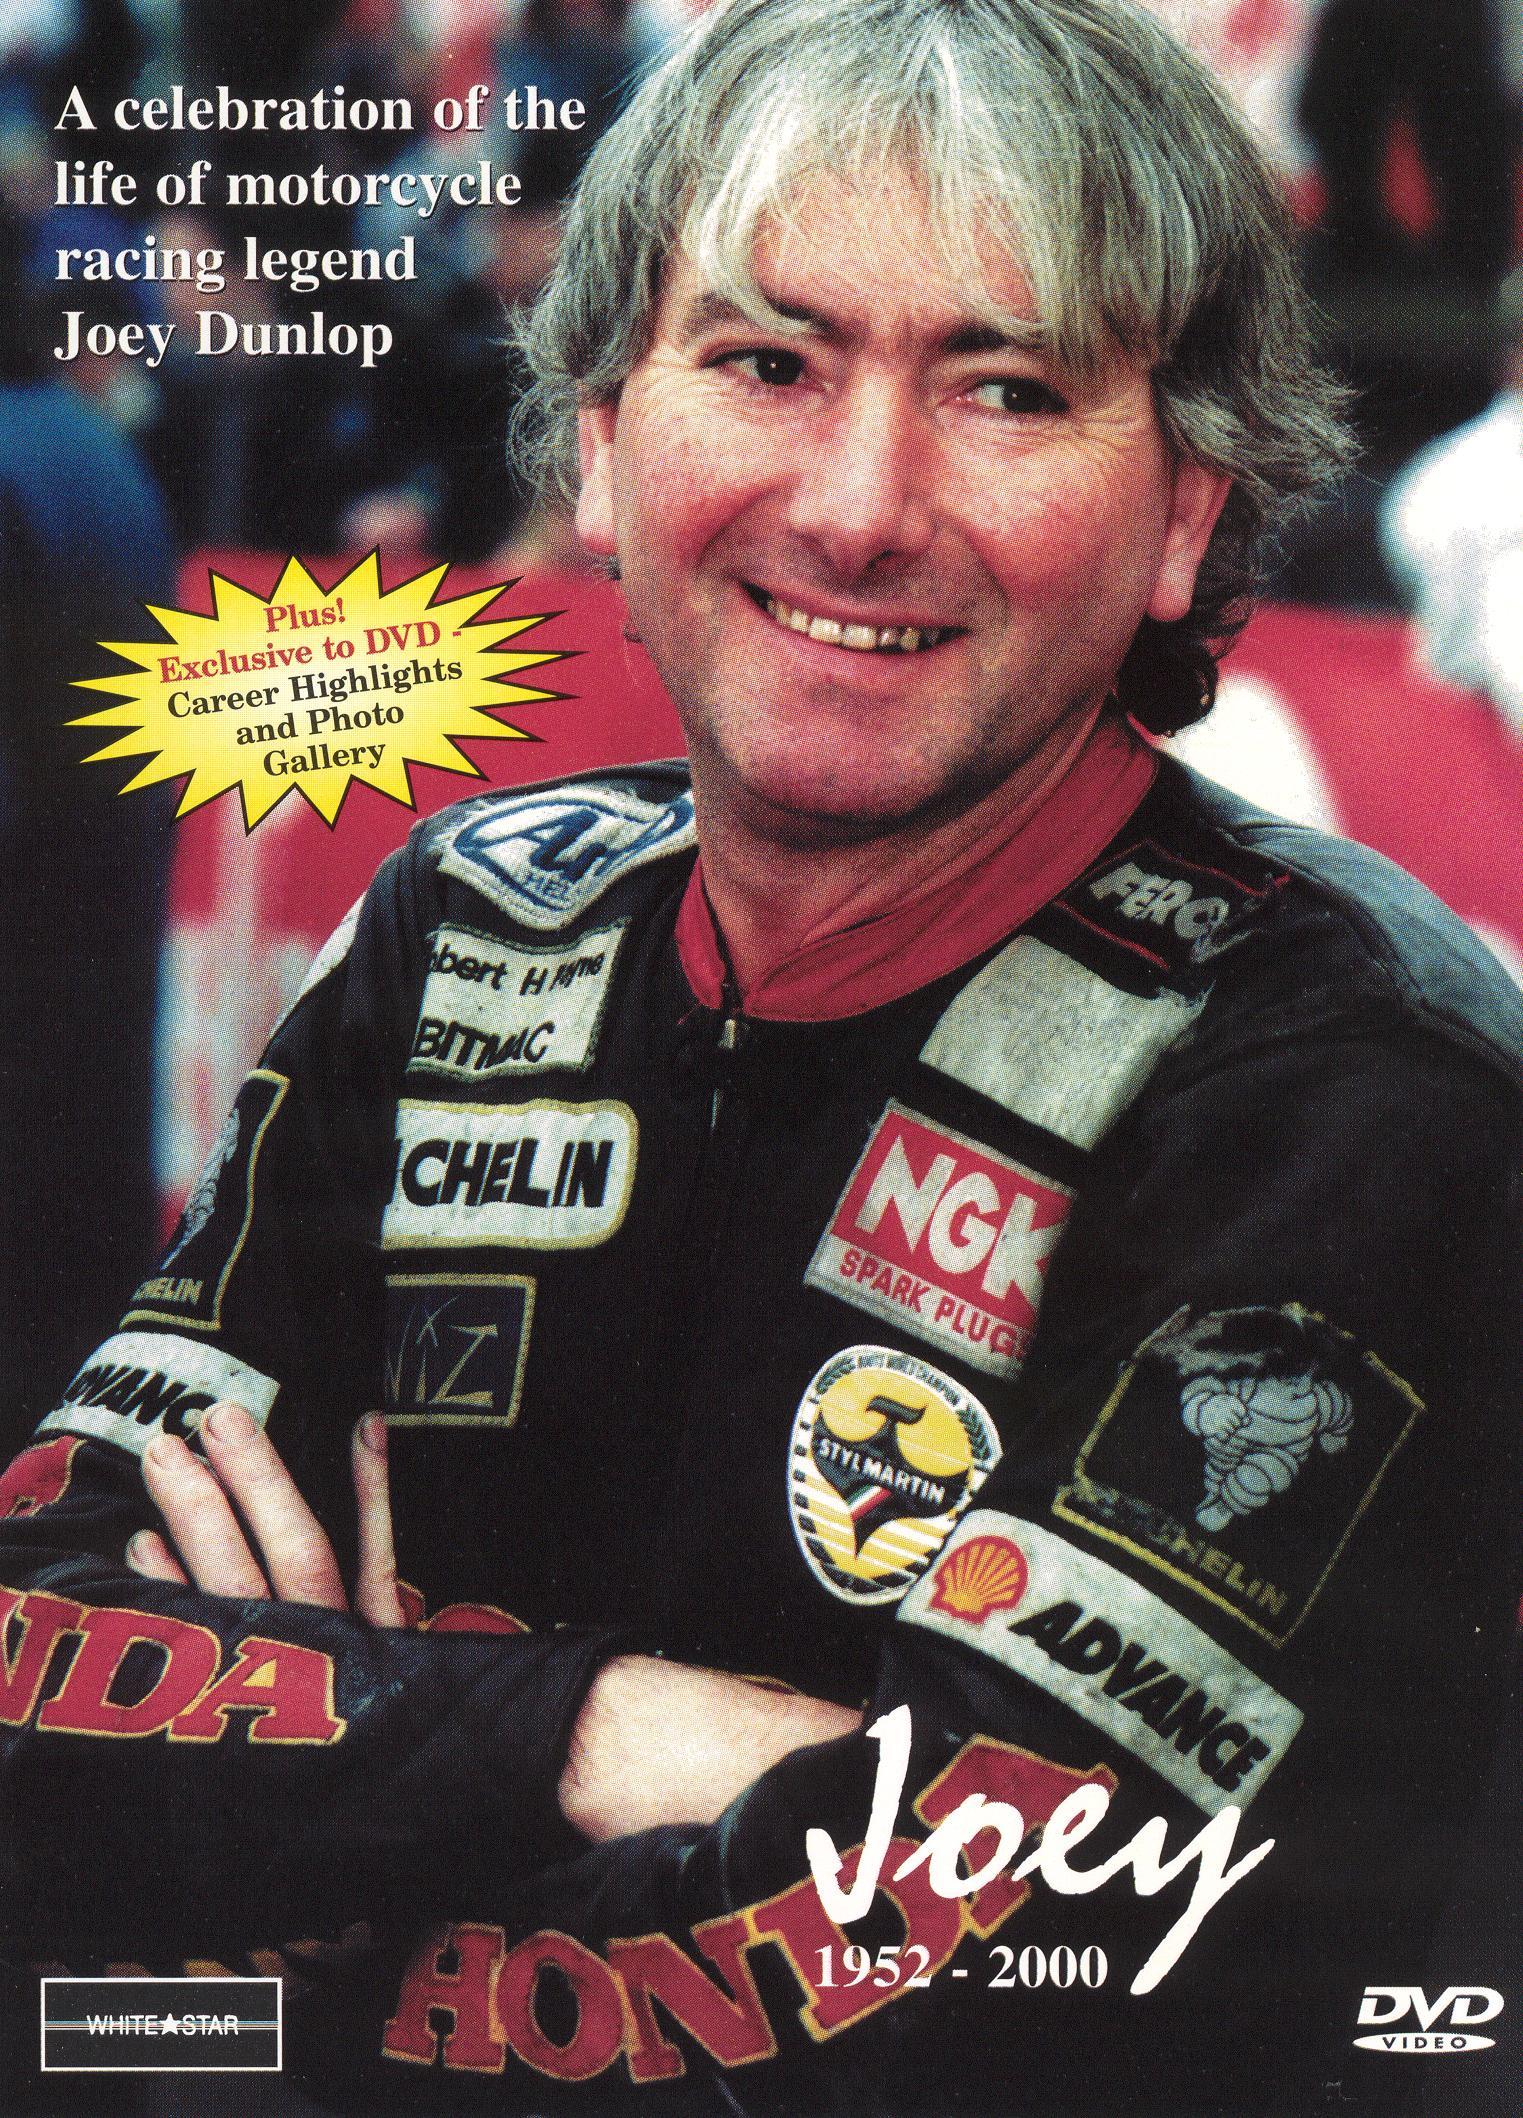 Joey Dunlop: 1952-2000